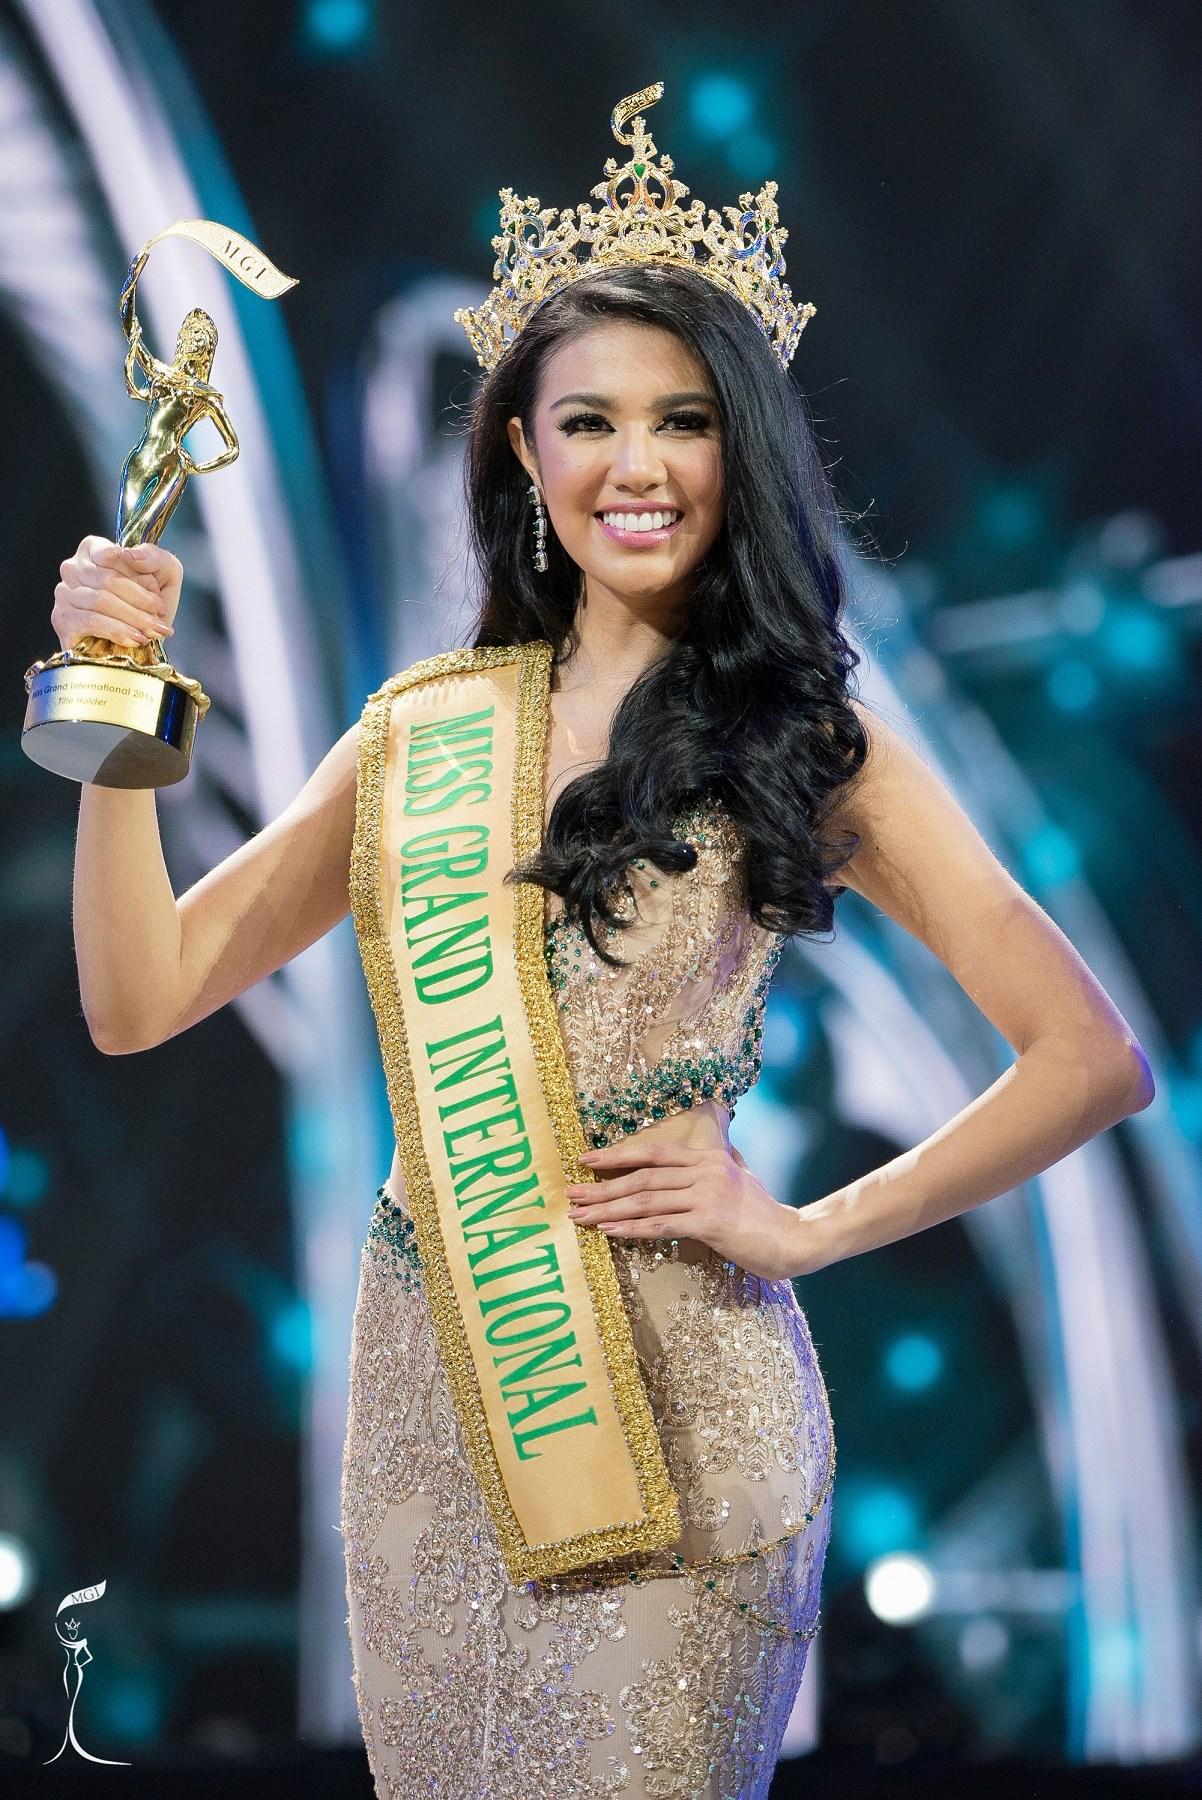 ariska putri, miss grand international 2016. Aeghps10